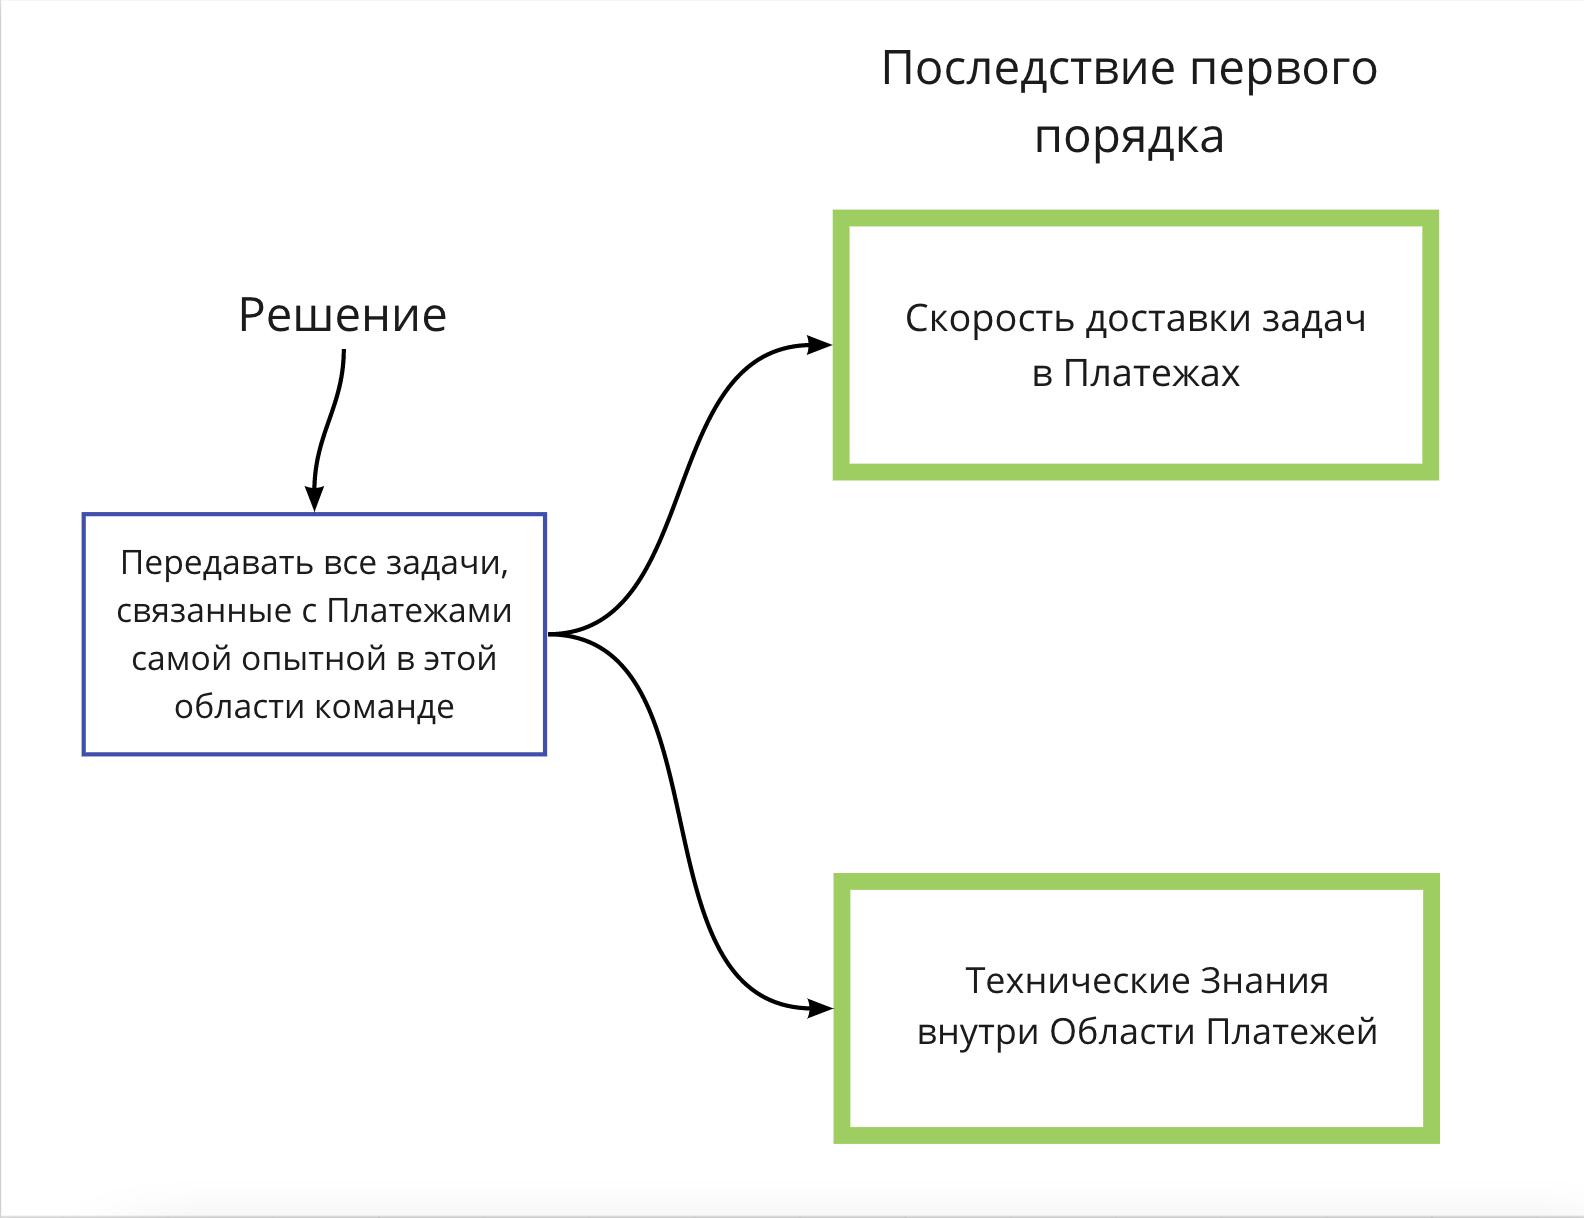 ScrumUA_Blog_Evgeniy_Labunskiy_First_Order_Consequence